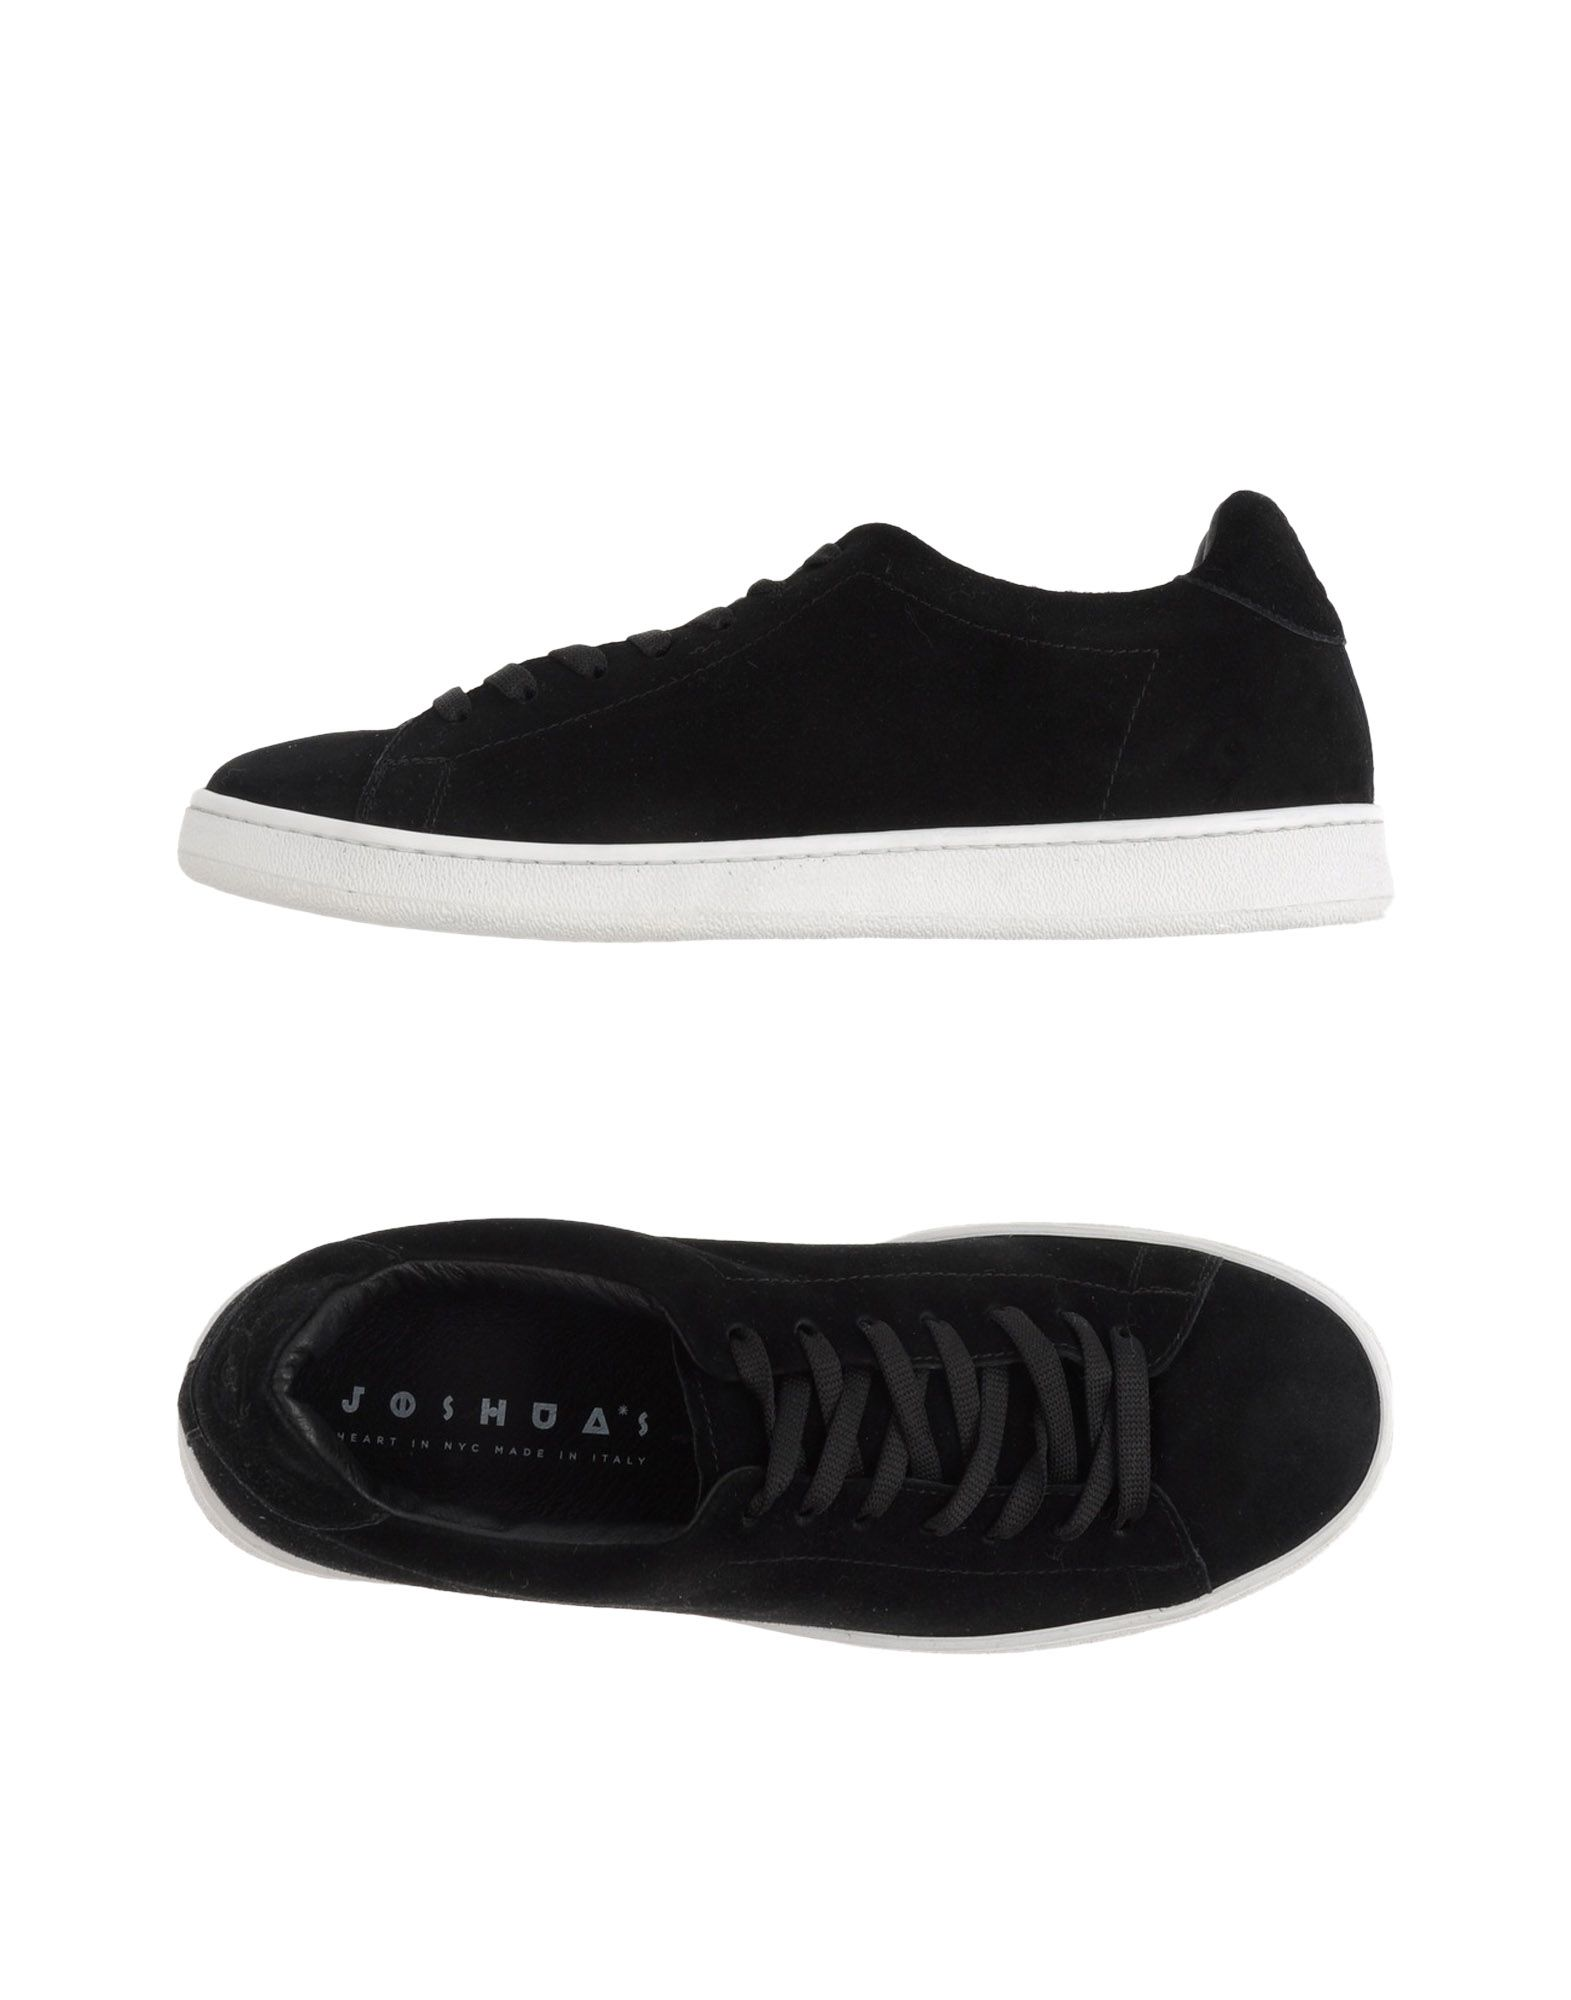 Moda Sneakers Joshua*S Donna - 11220614NG